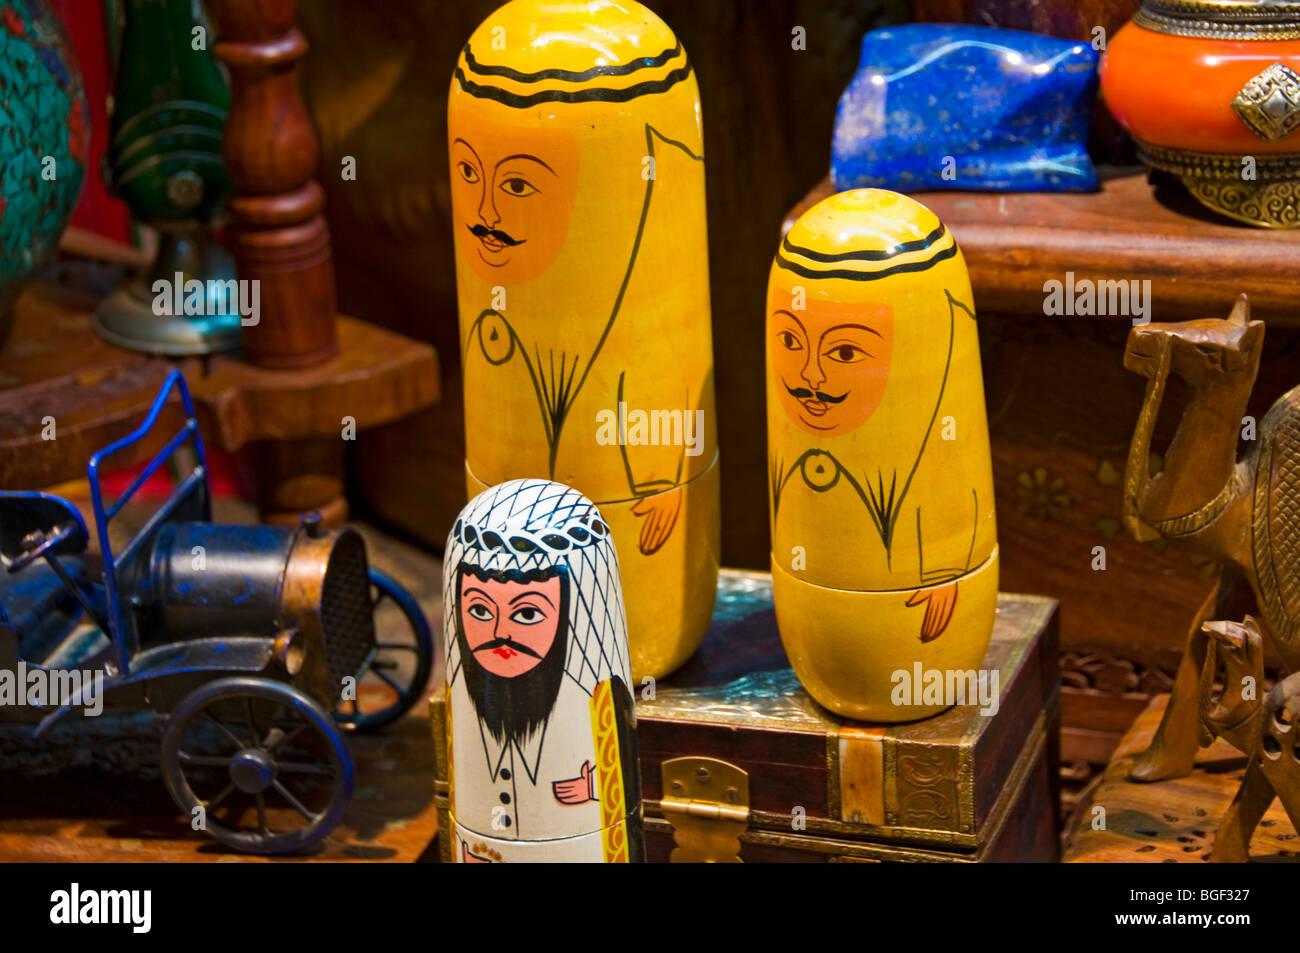 Handicrafts Oman Stock Photos Handicrafts Oman Stock Images Alamy